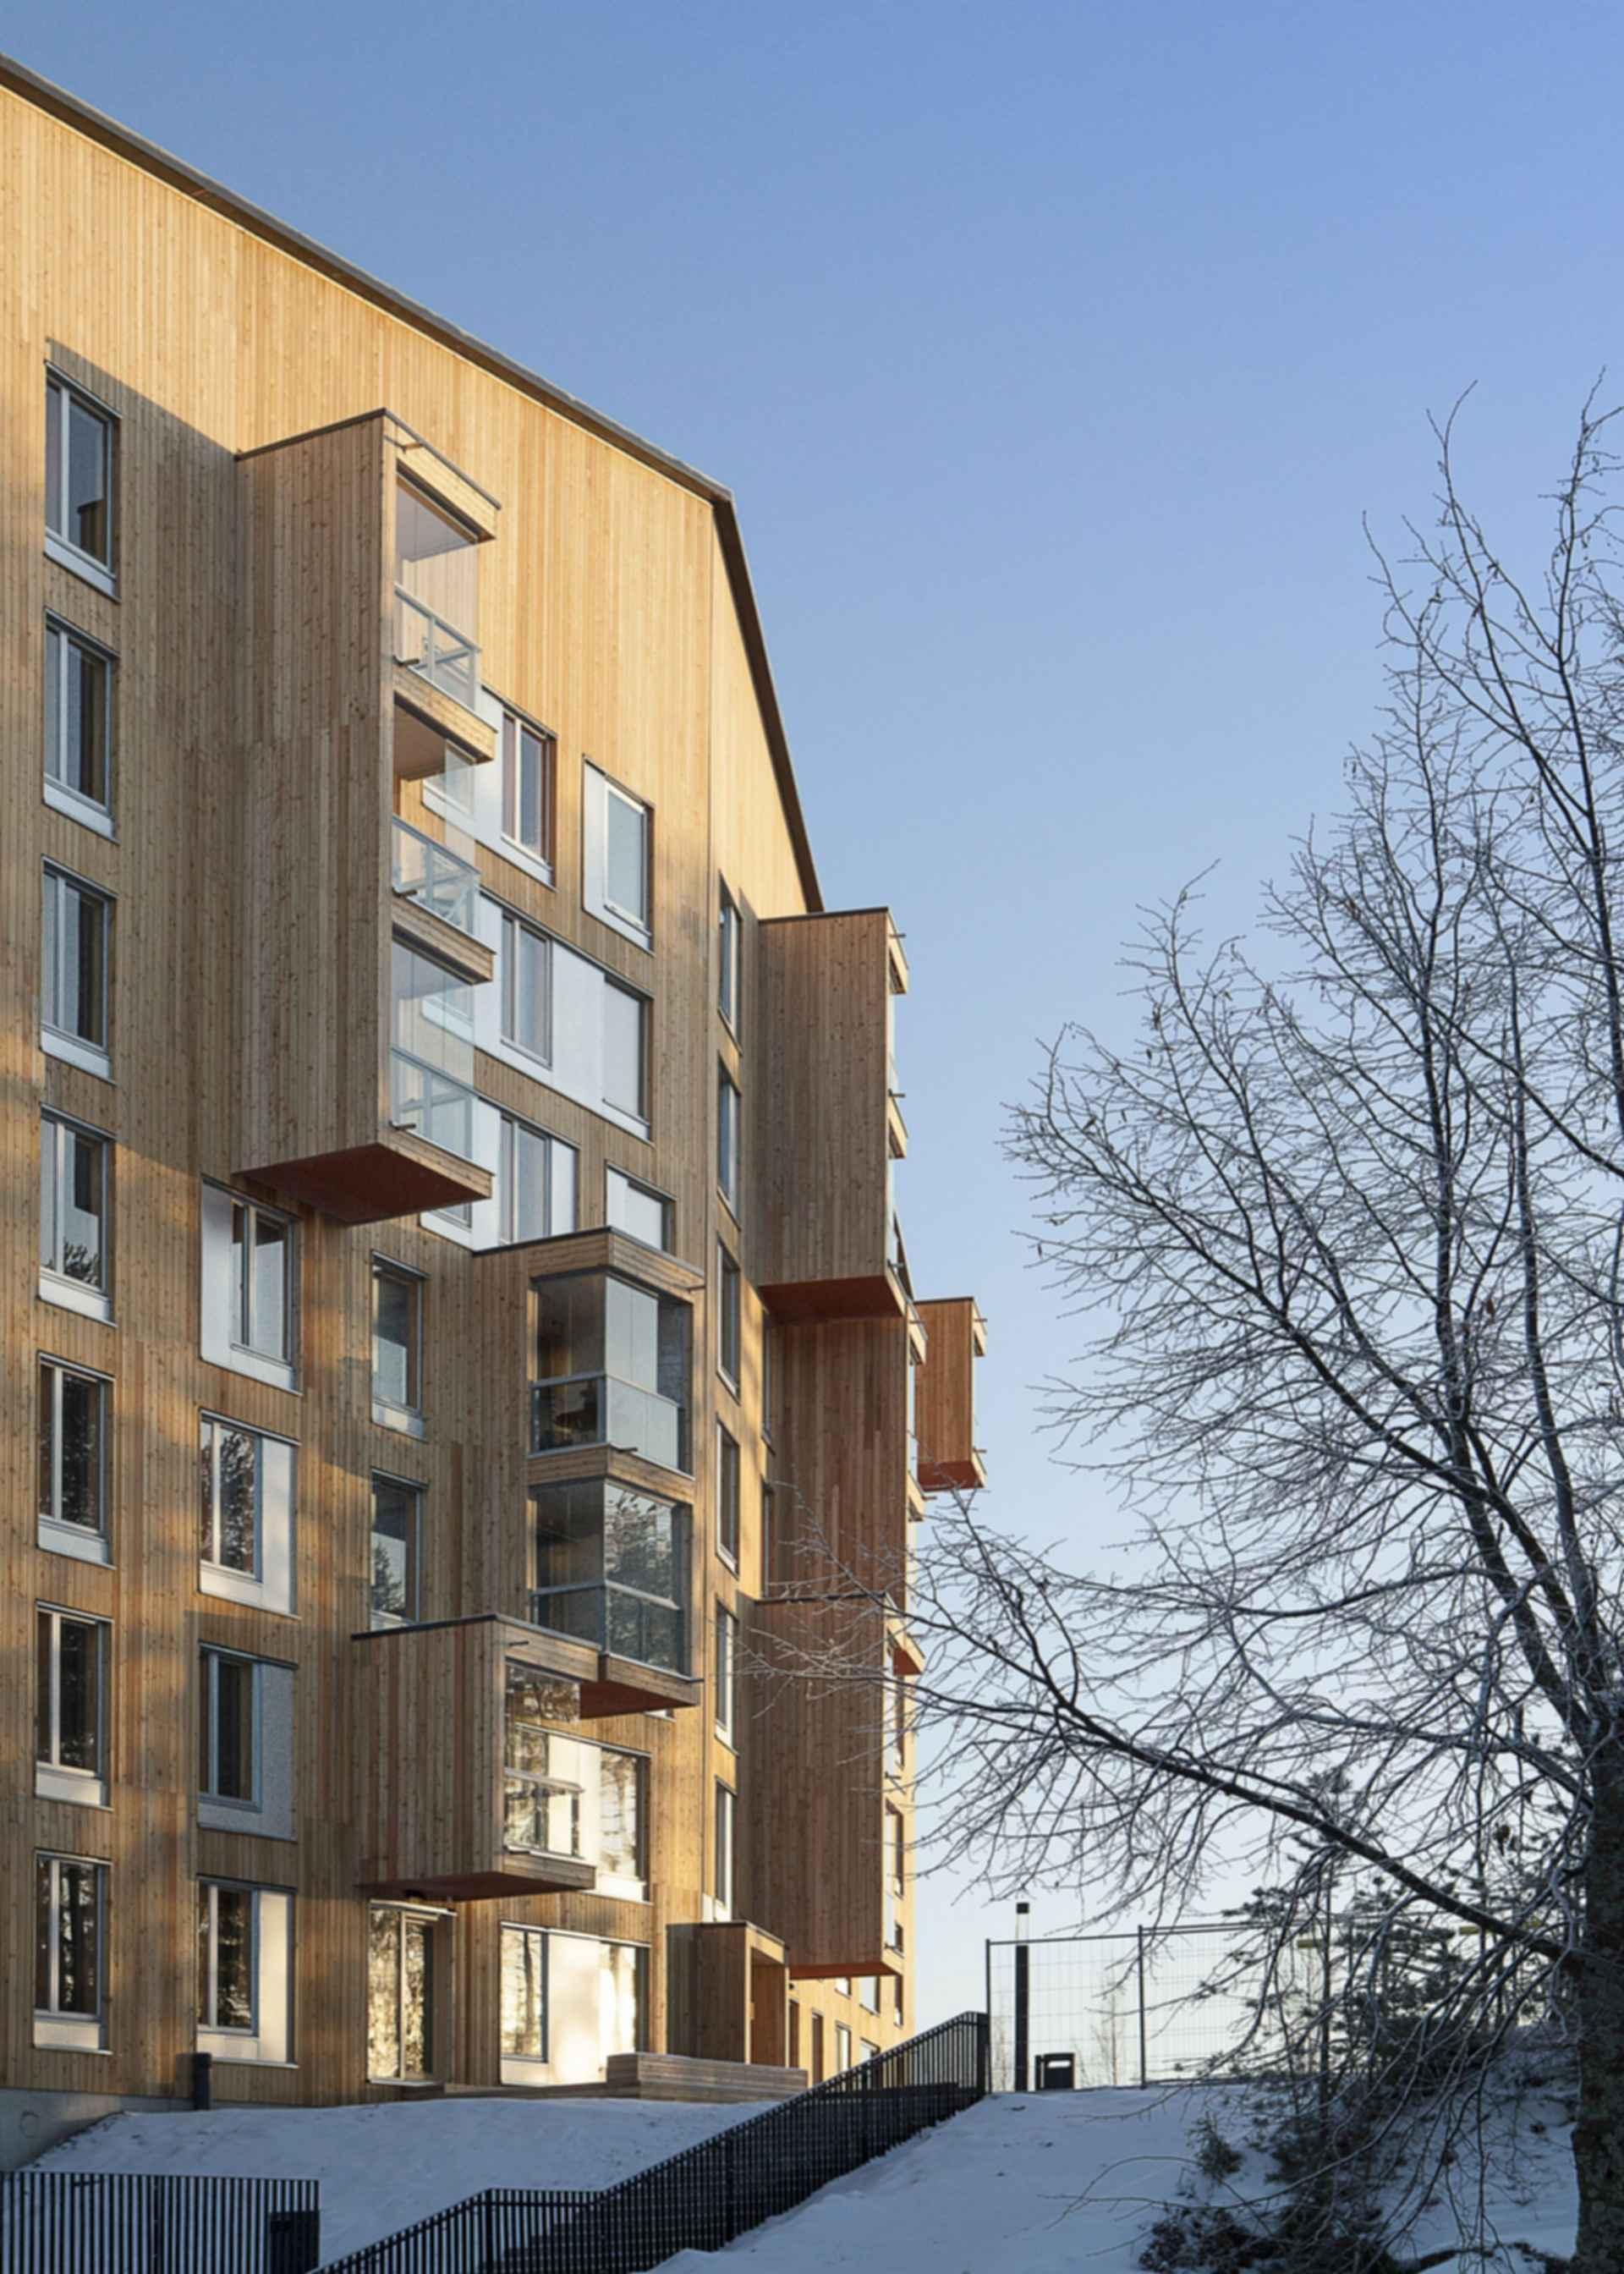 Puukuokka Housing Block - Exterior/Entrance